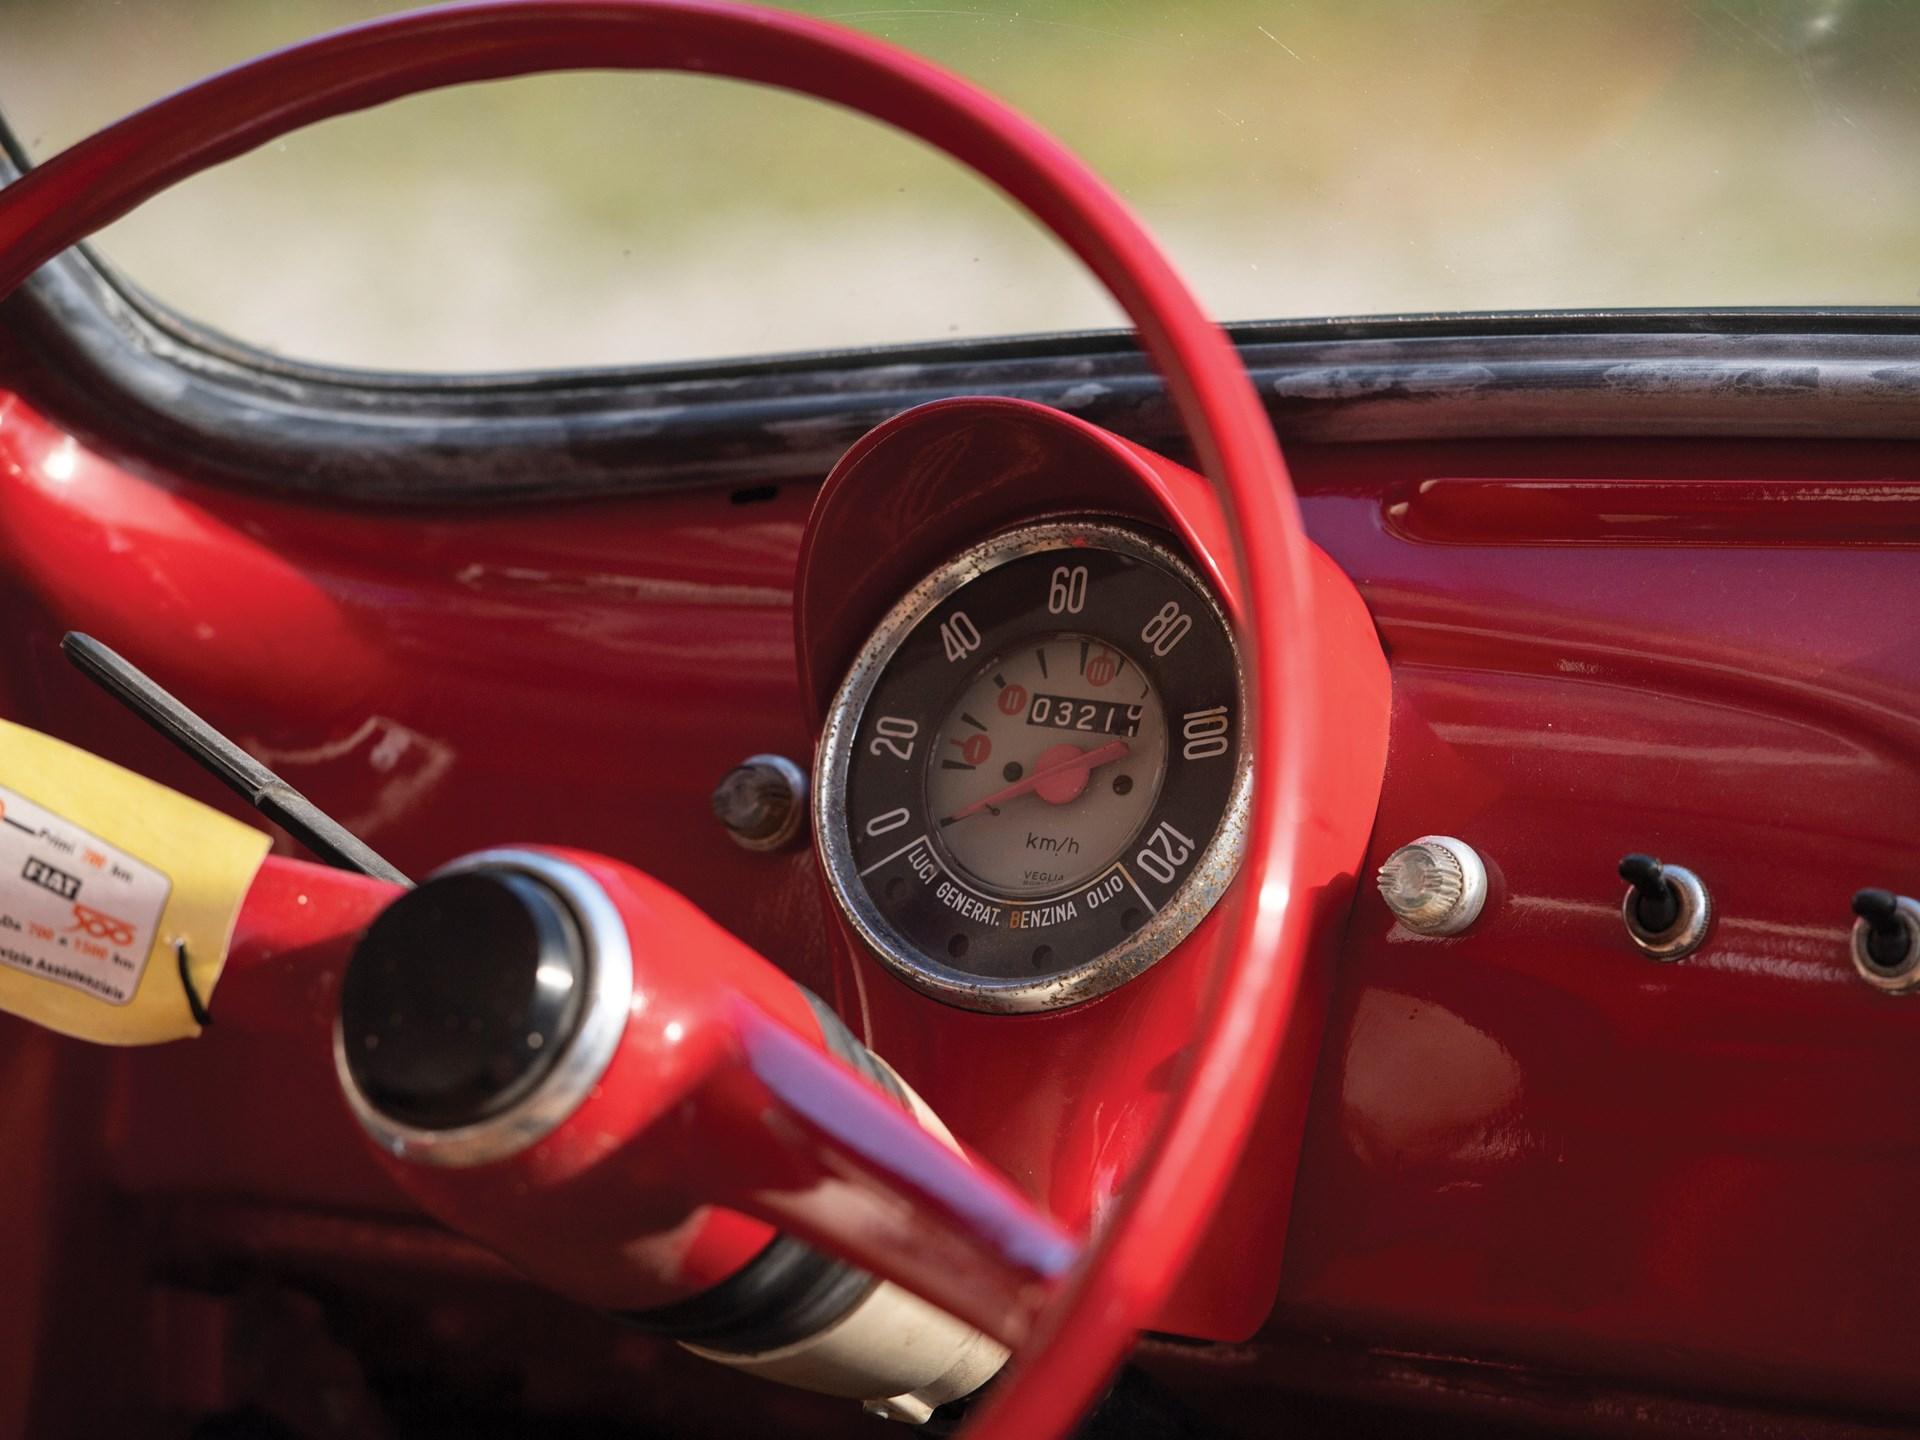 1968 Fiat Jolly gauges